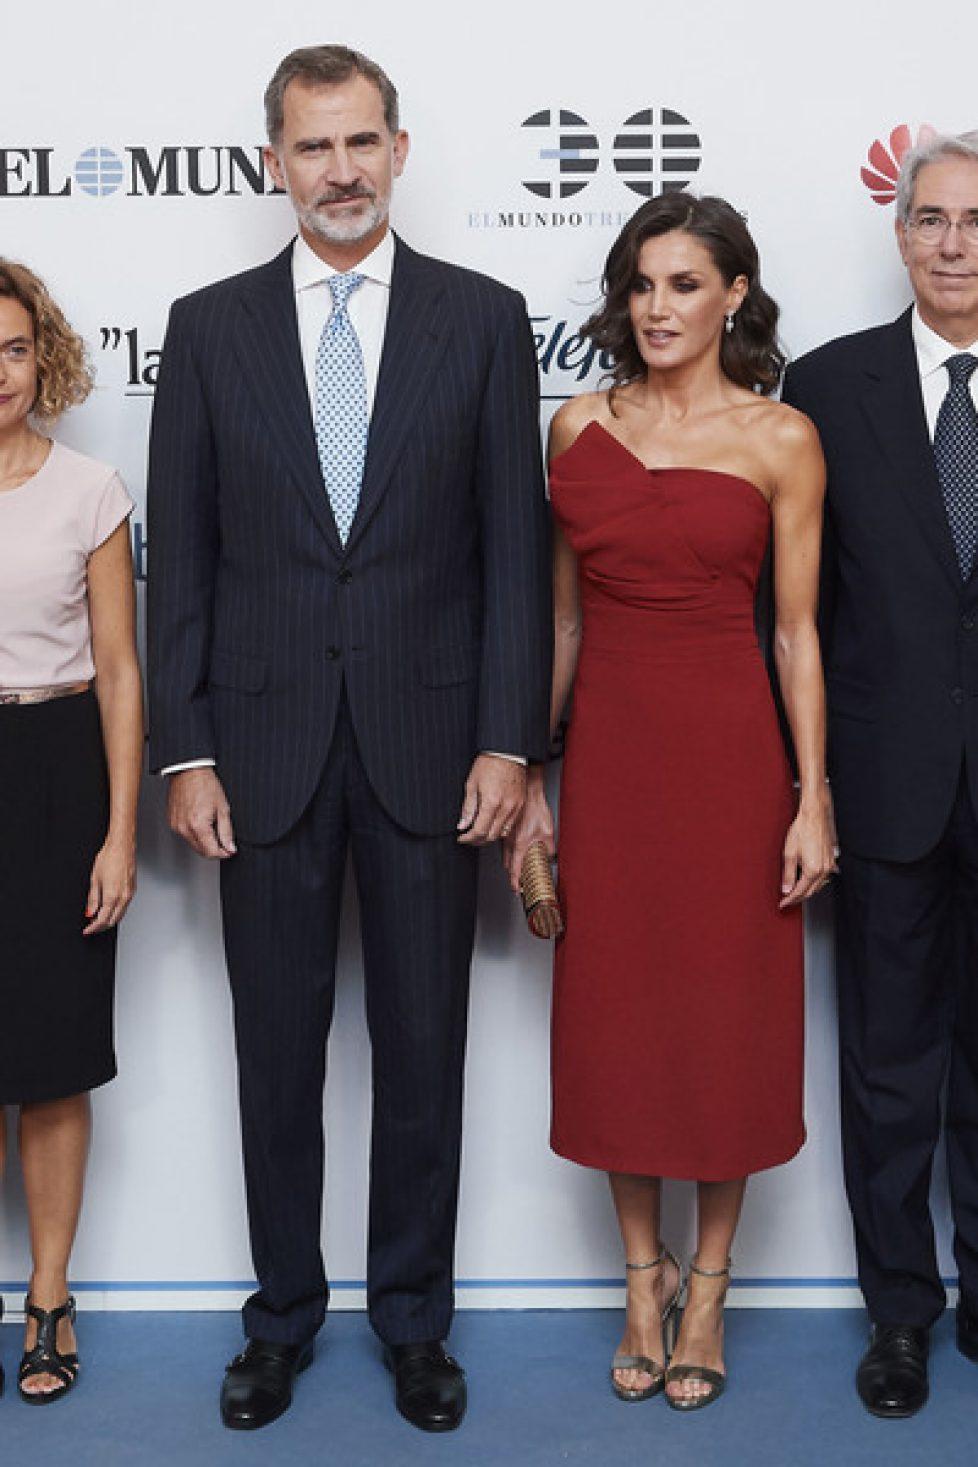 Spanish+Royals+Attend+El+Mundo+Newspaper+30th+YA2uhvBSVbbl